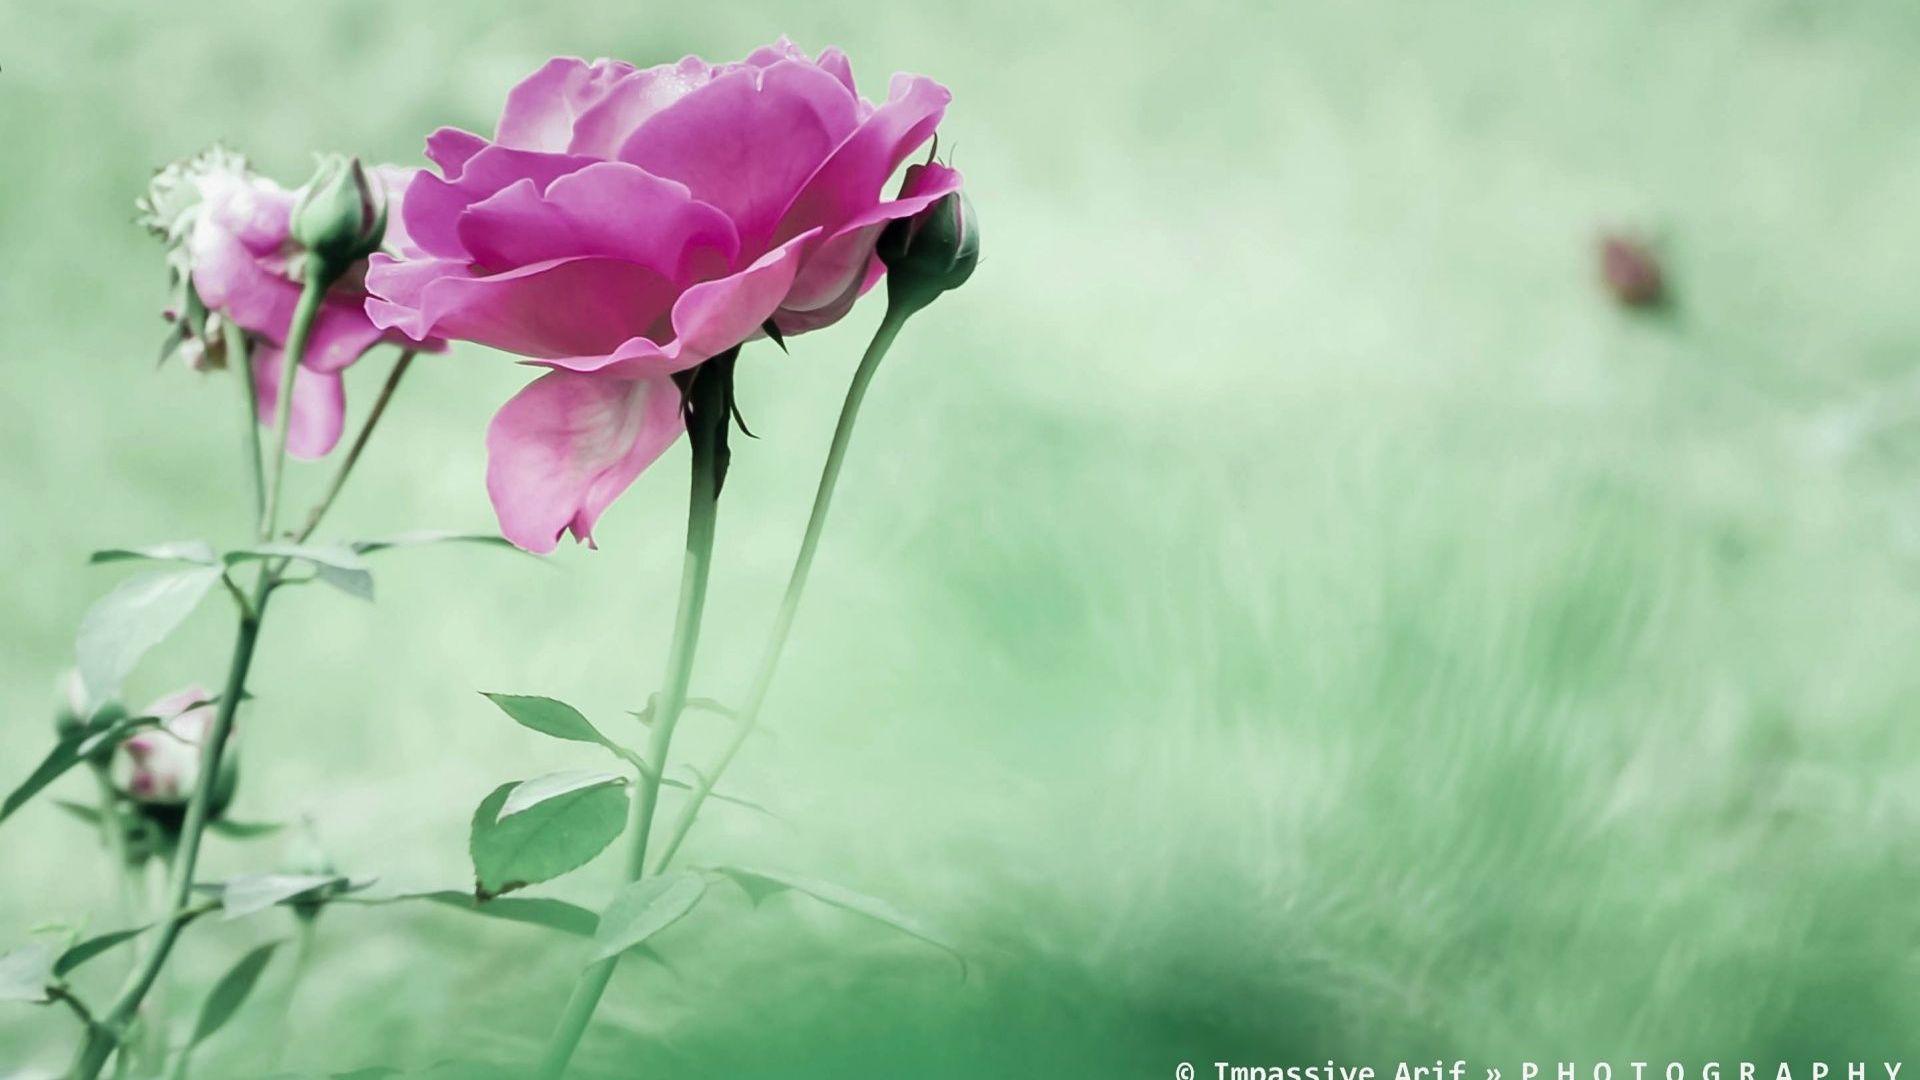 Herunterladen 1920x1080 Full HD Hintergrundbilder rosen